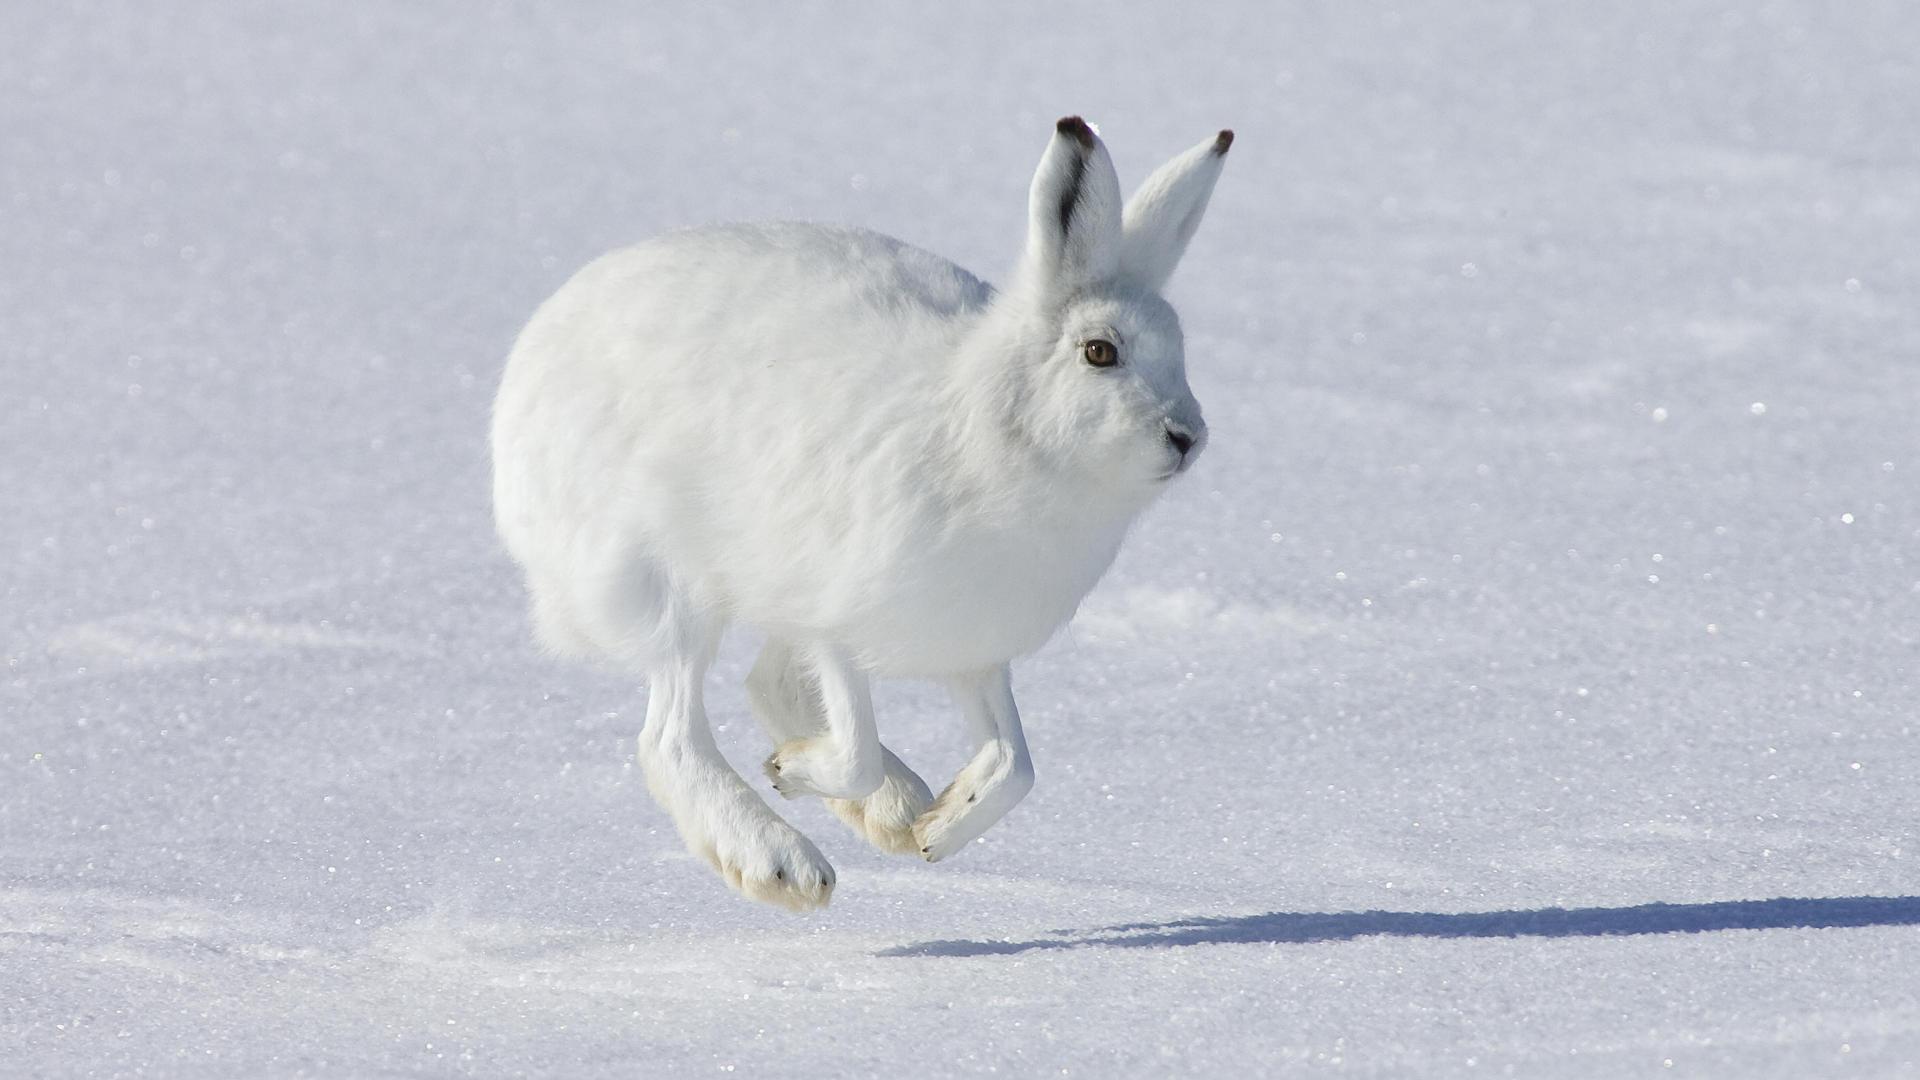 White Rabbit on Snow Wallpaper | Wide Screen Wallpaper 1080p,2K,4K